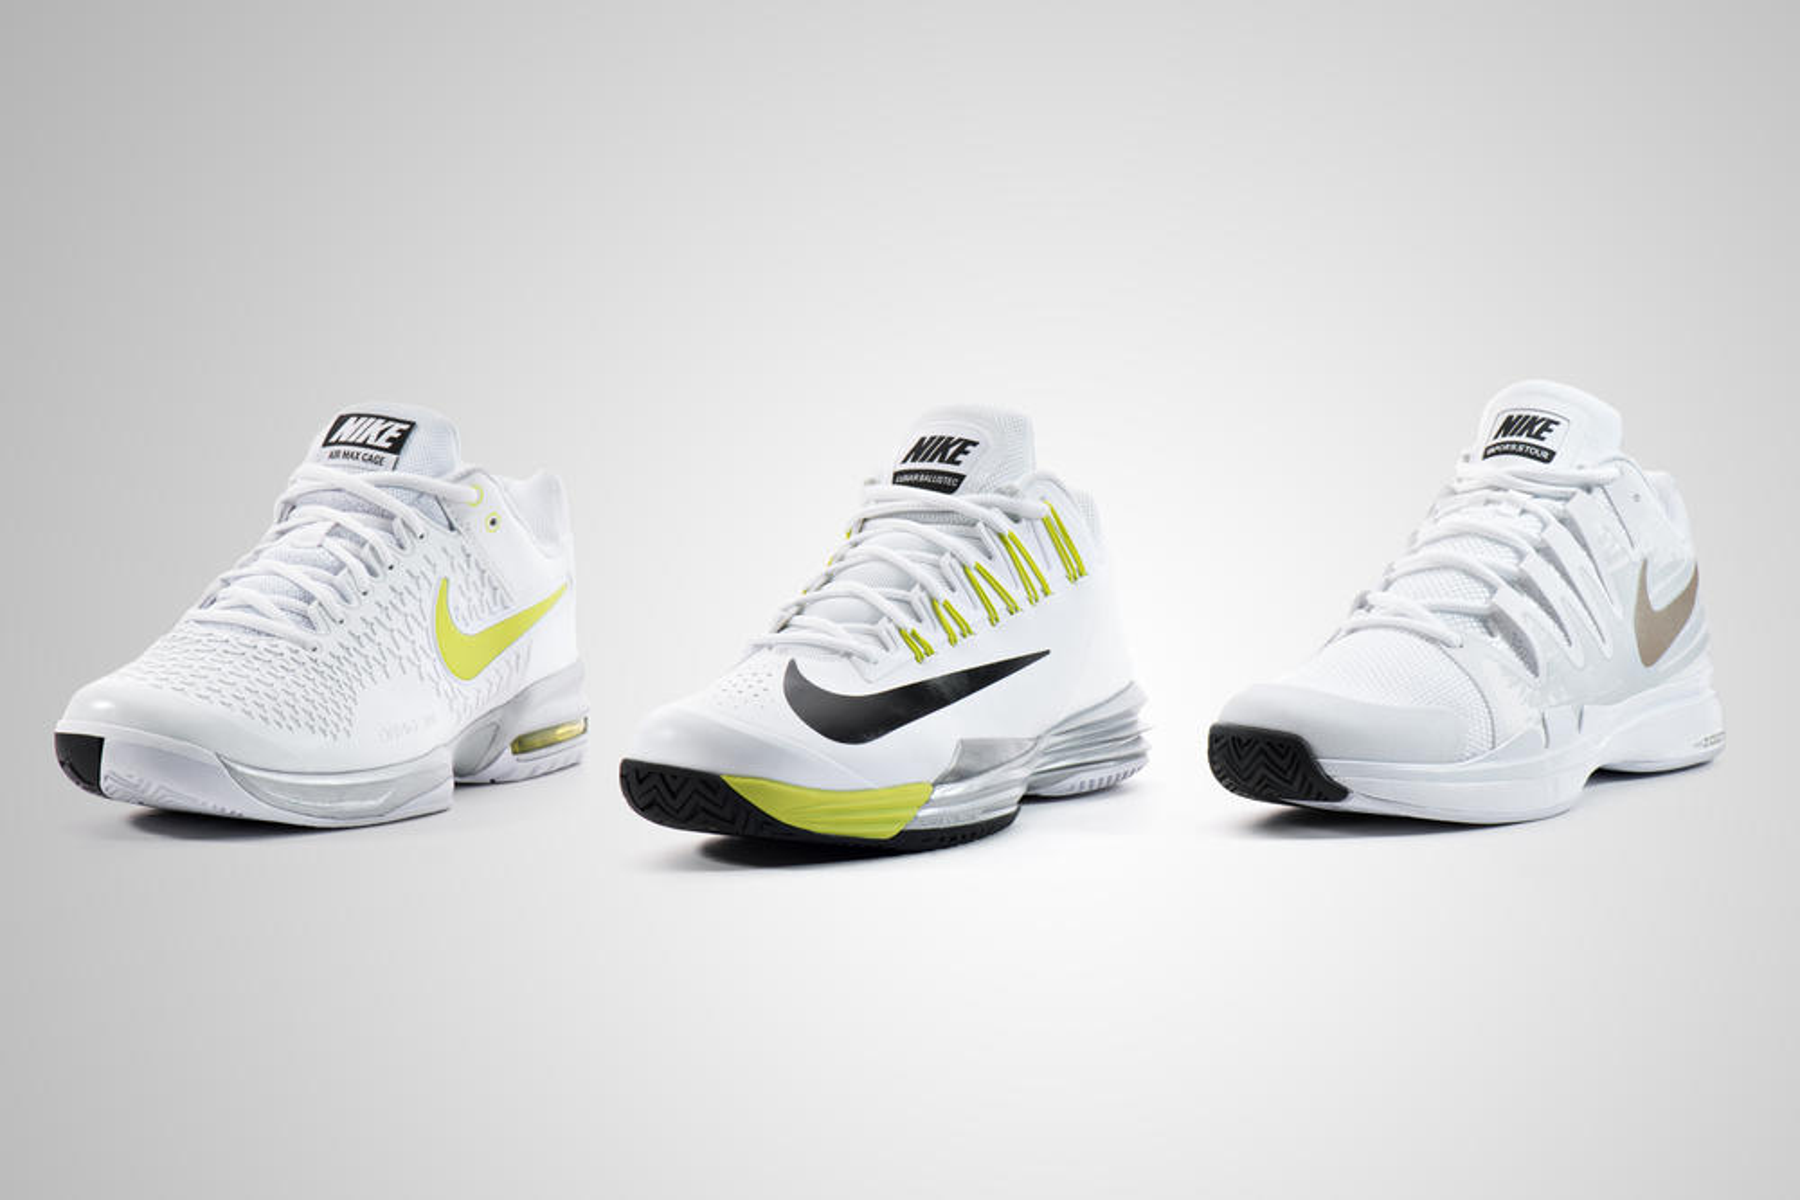 Nike Tennis 2014 Wimbledon Footwear Collection